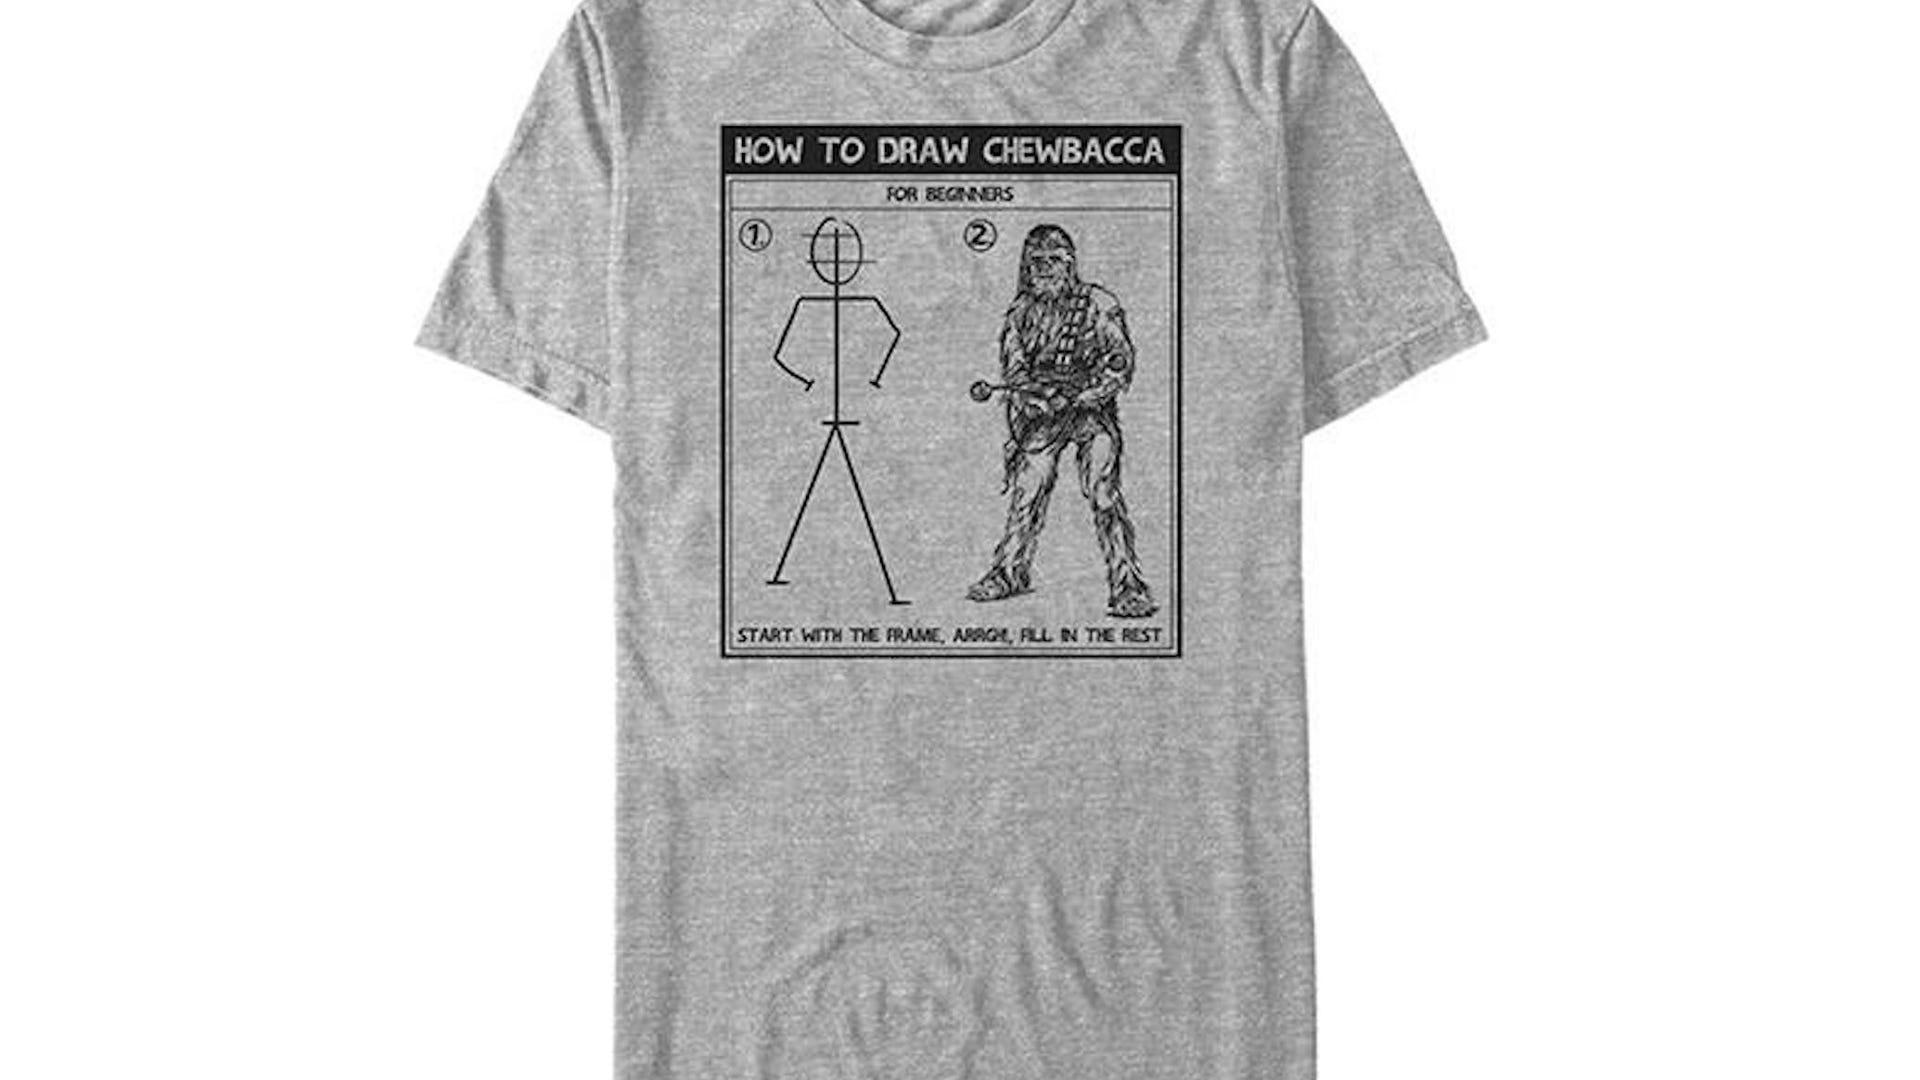 How To Draw Chewbacca shirt